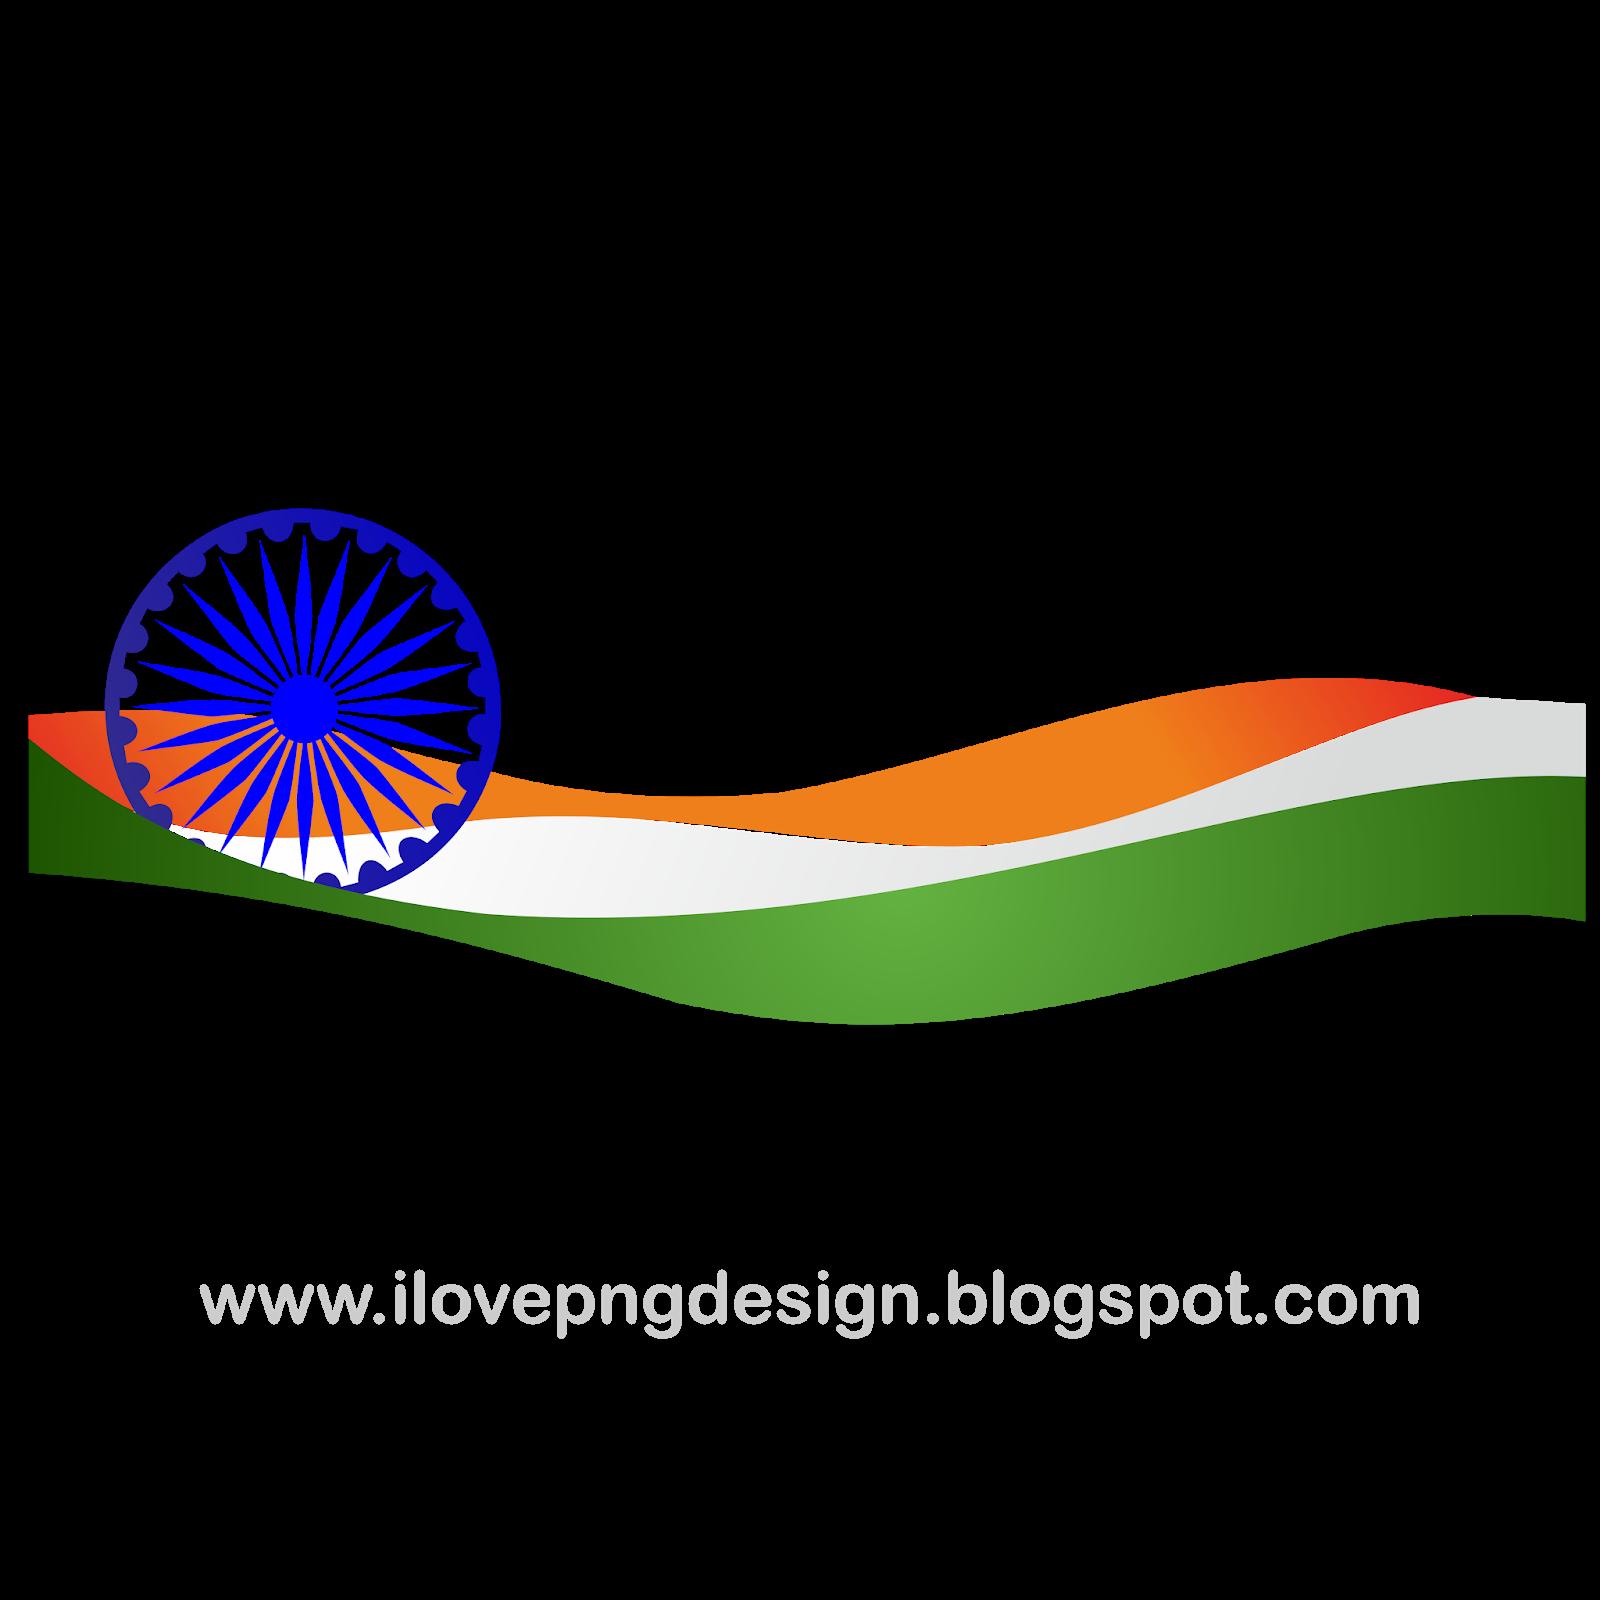 Rk Graphic Design Tiranga Indian Flag In Png File Up to 20 images, max 5 mb each. rk graphic design tiranga indian flag